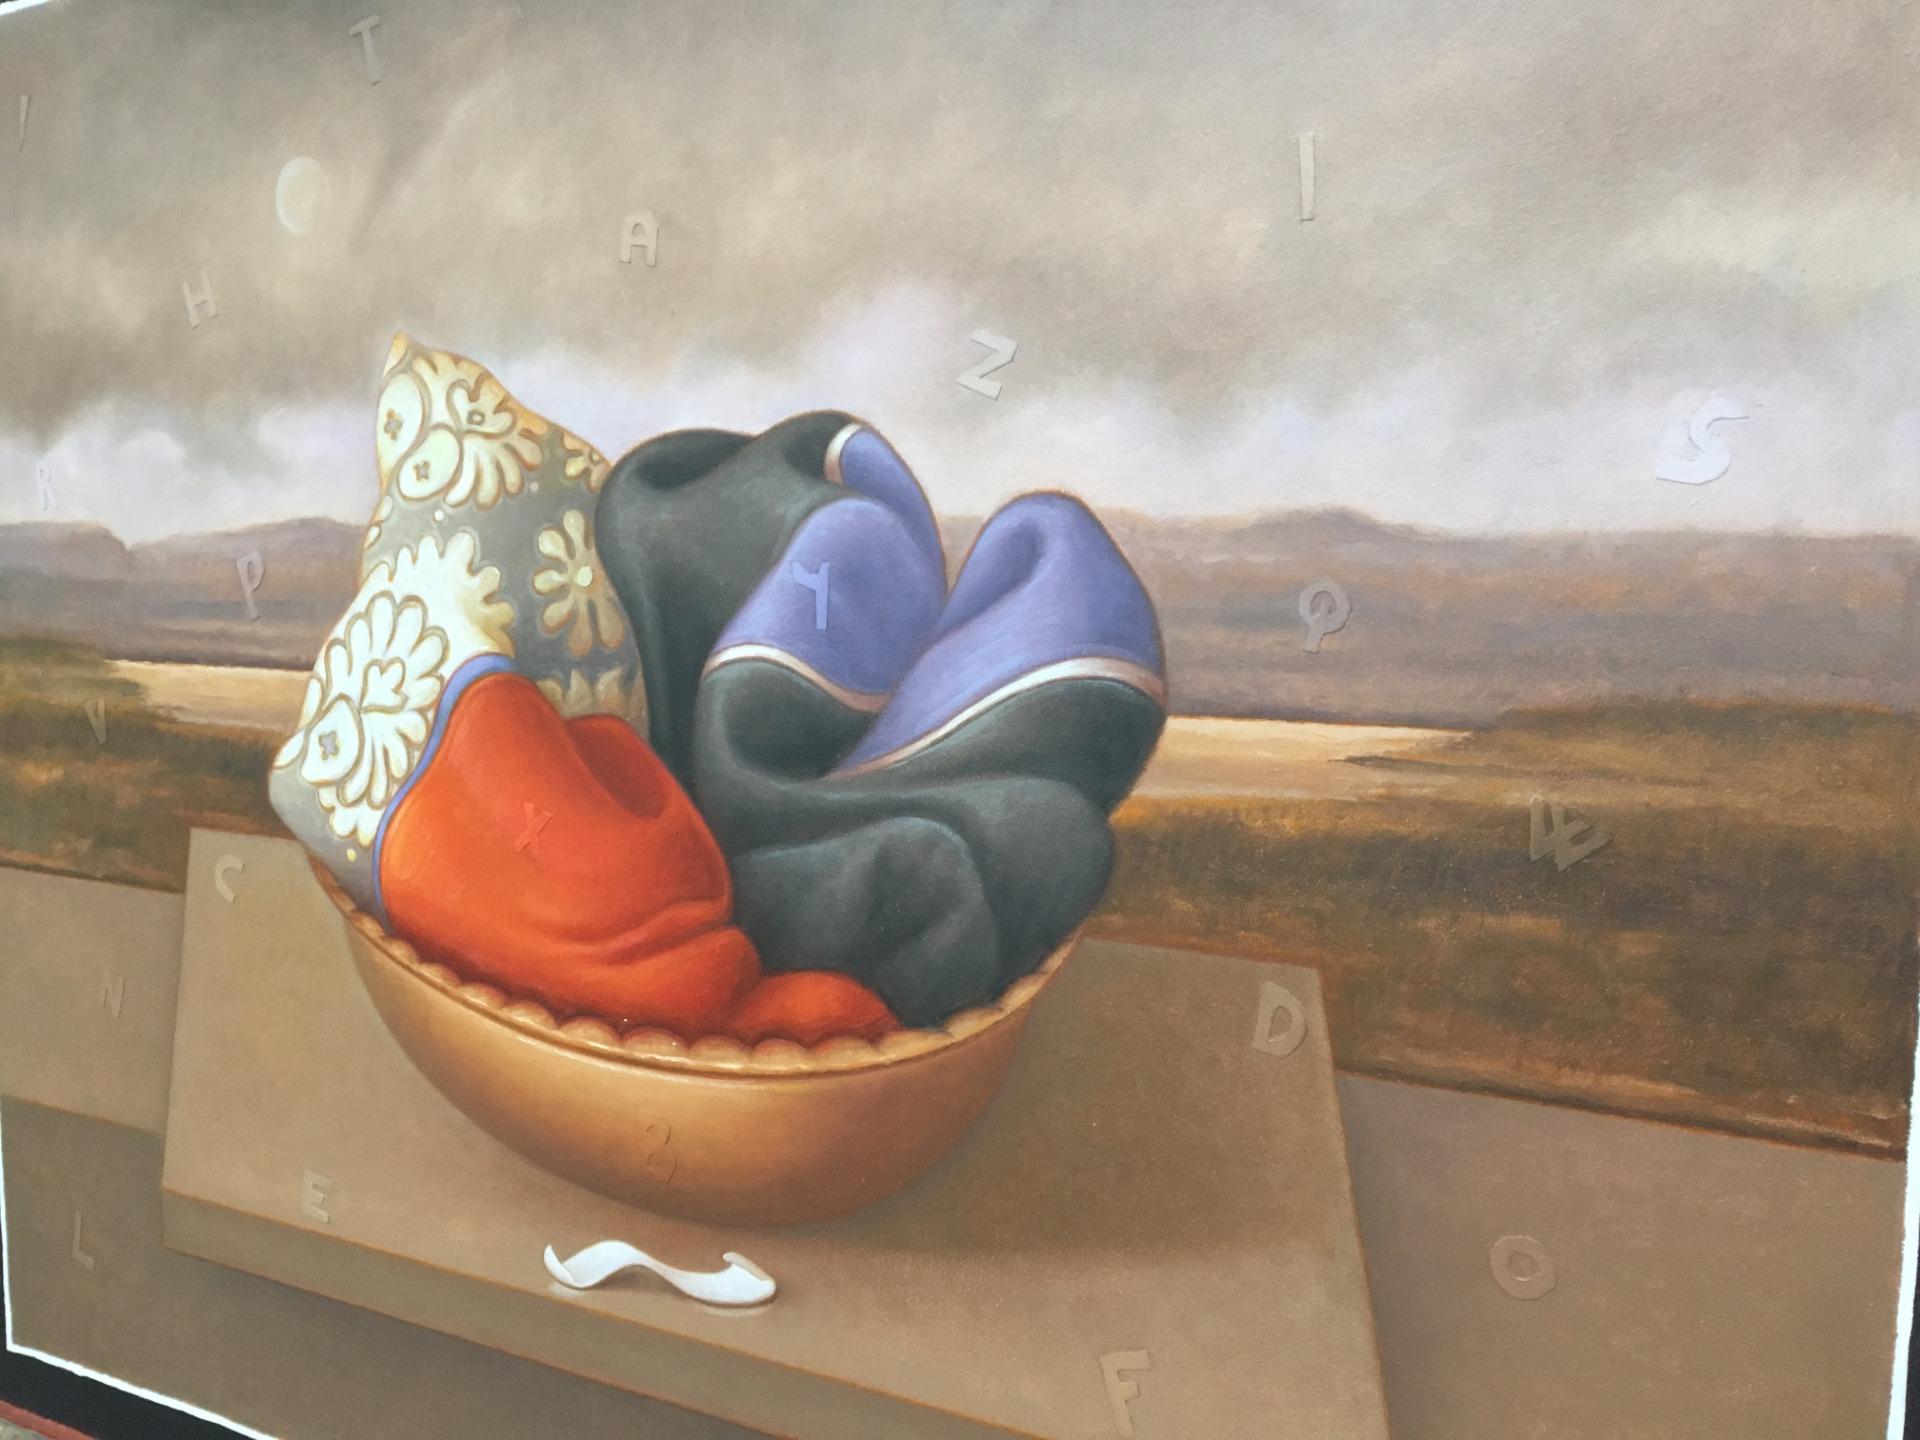 thumb9|G.L.BELLORINI NATURA MORTA 1